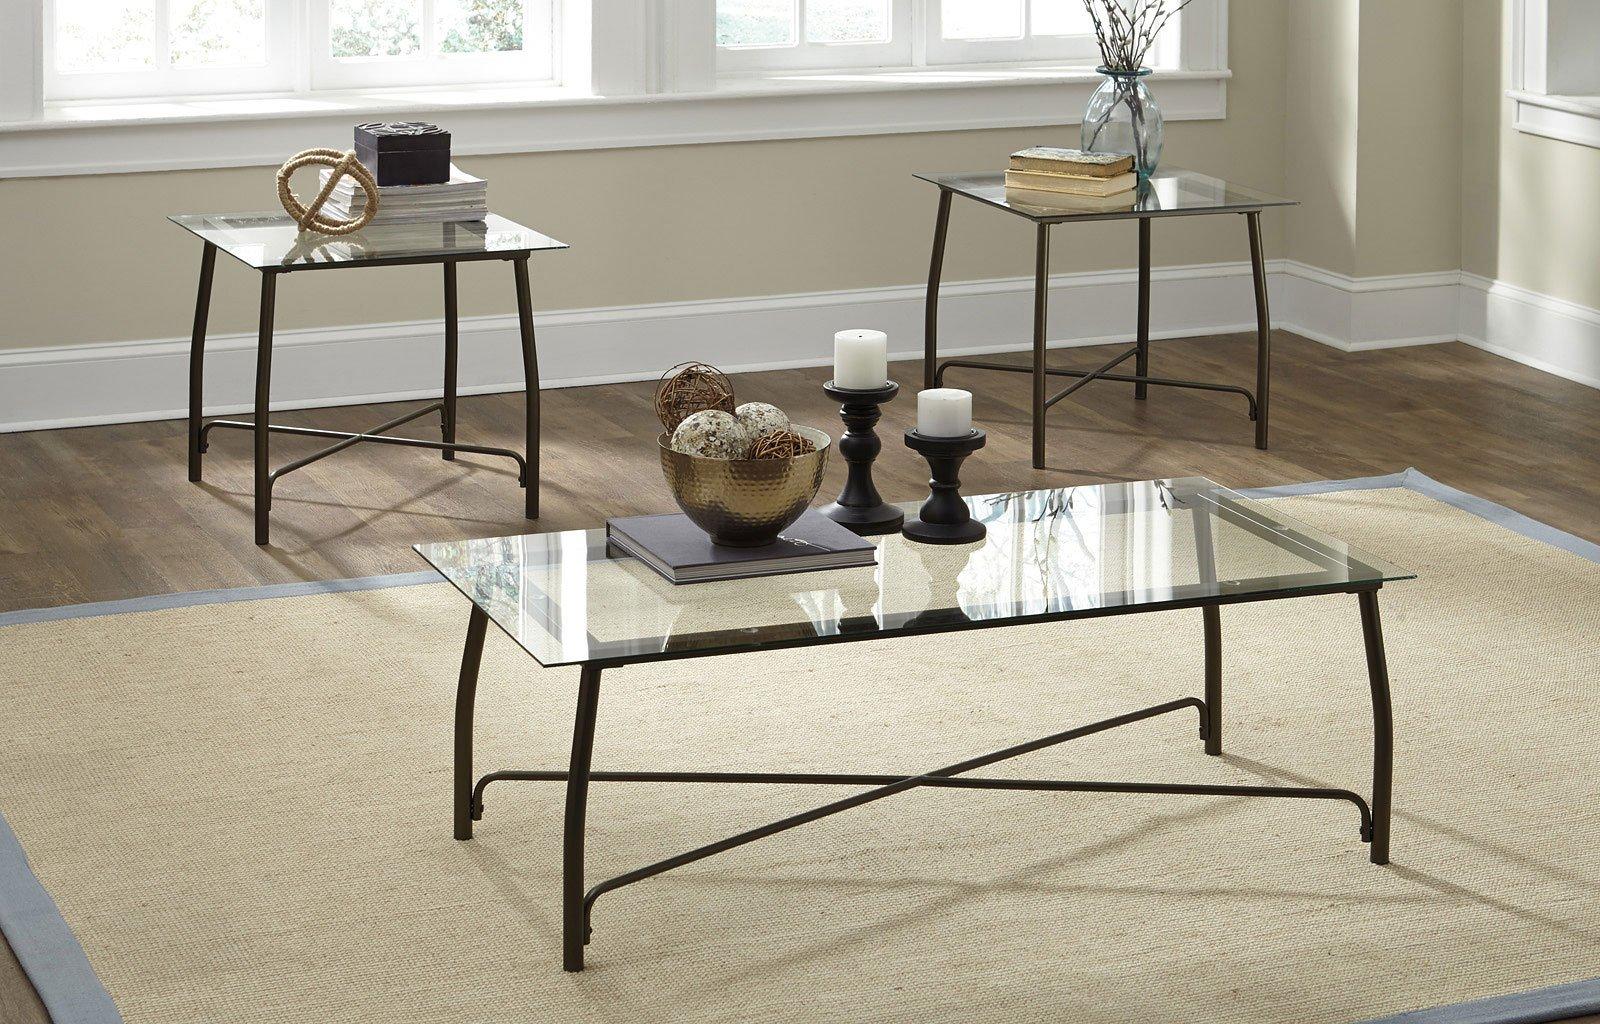 Bavello Indigo Living Room Set by Benchcraft   FurniturePick